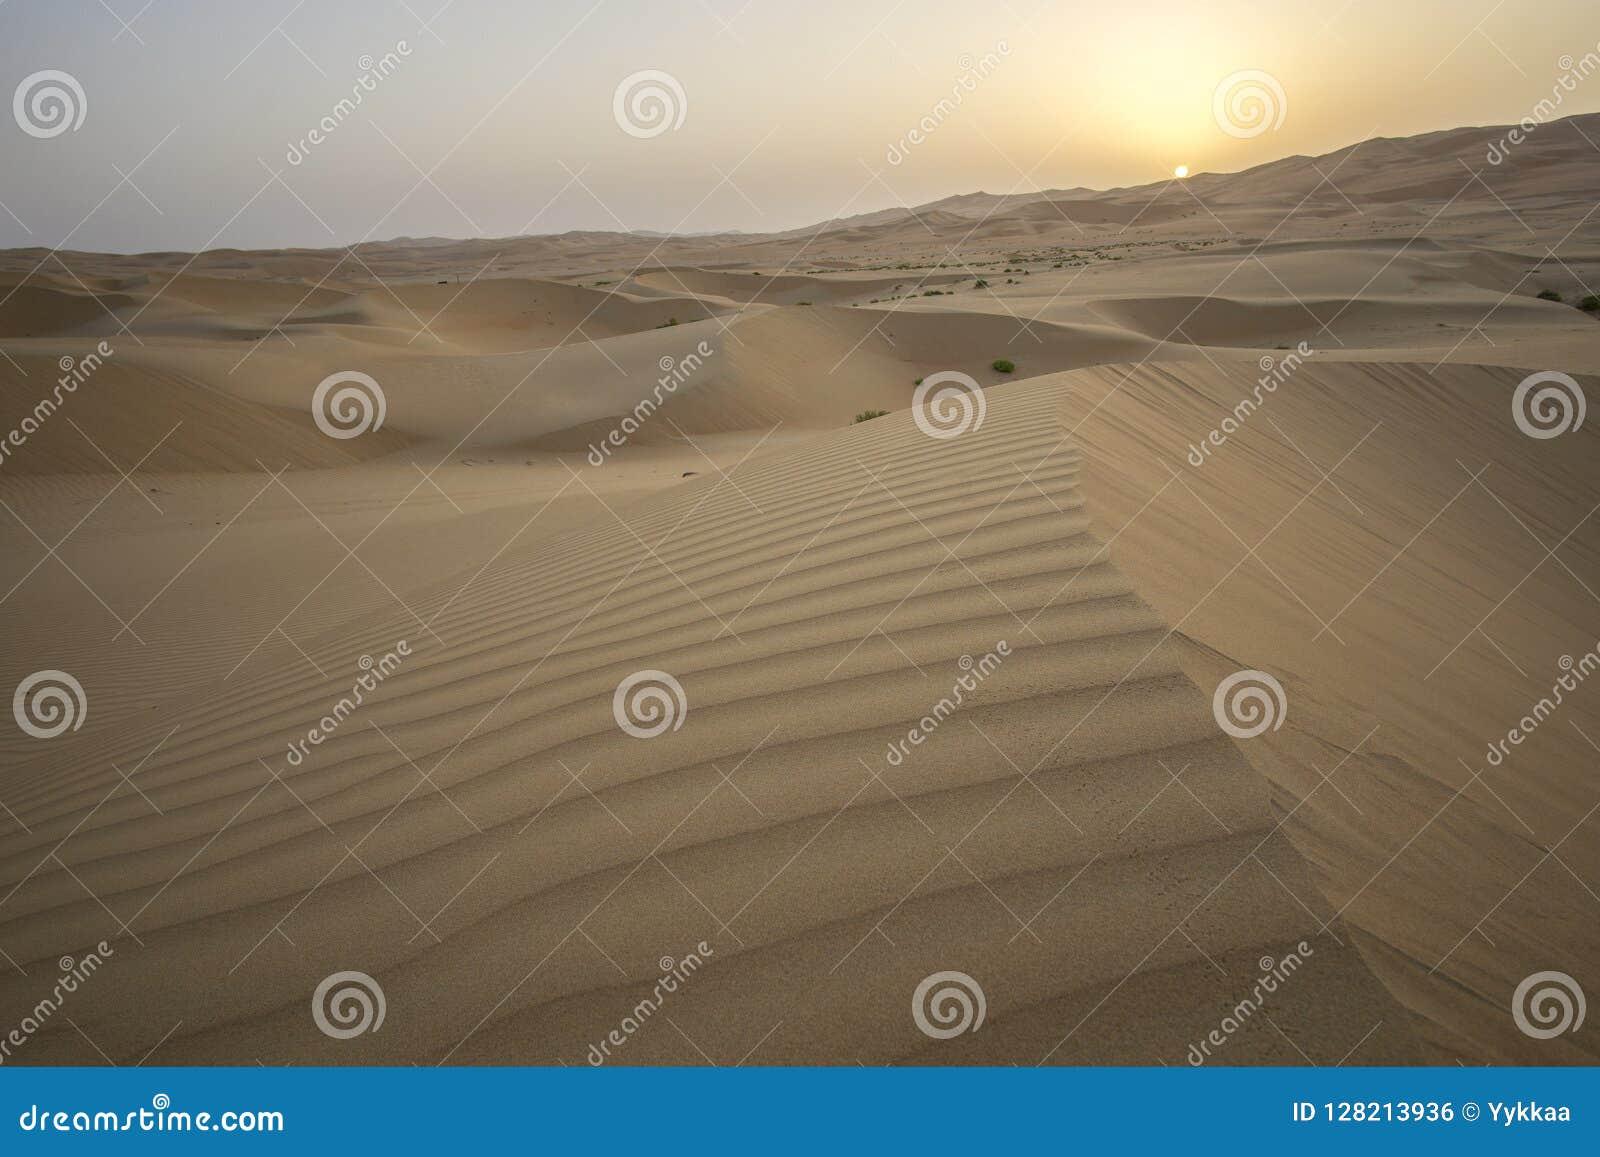 Beautiful Rub al Khali desert at sunrise